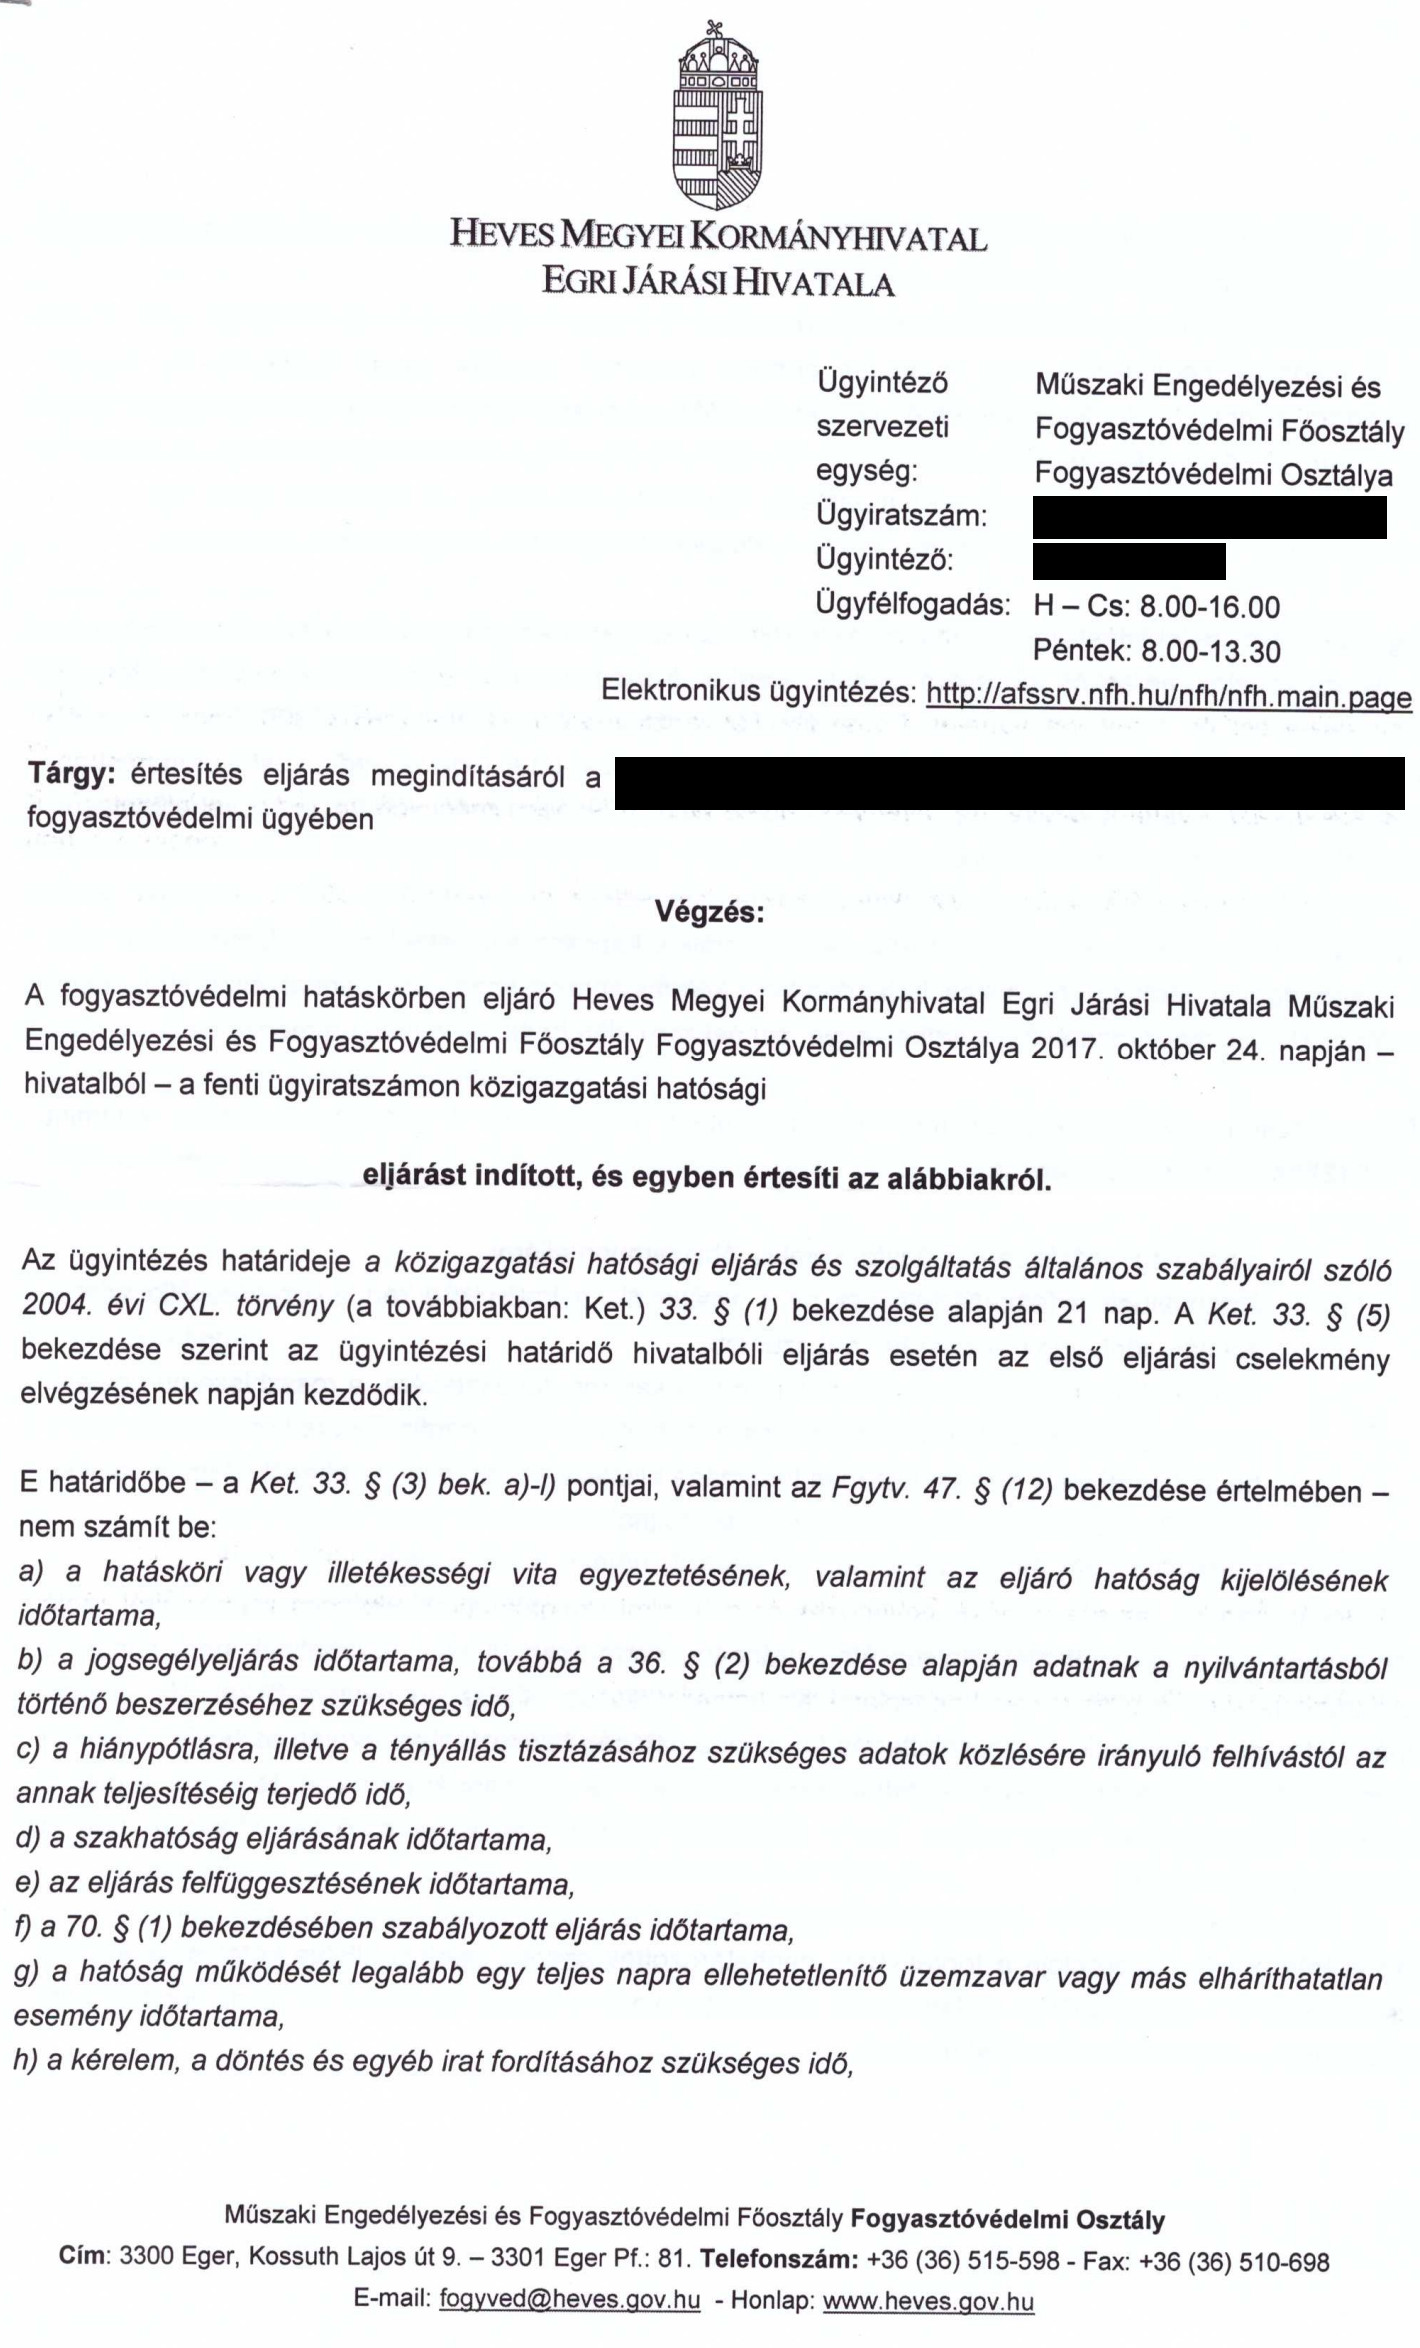 prestashop_vegzes